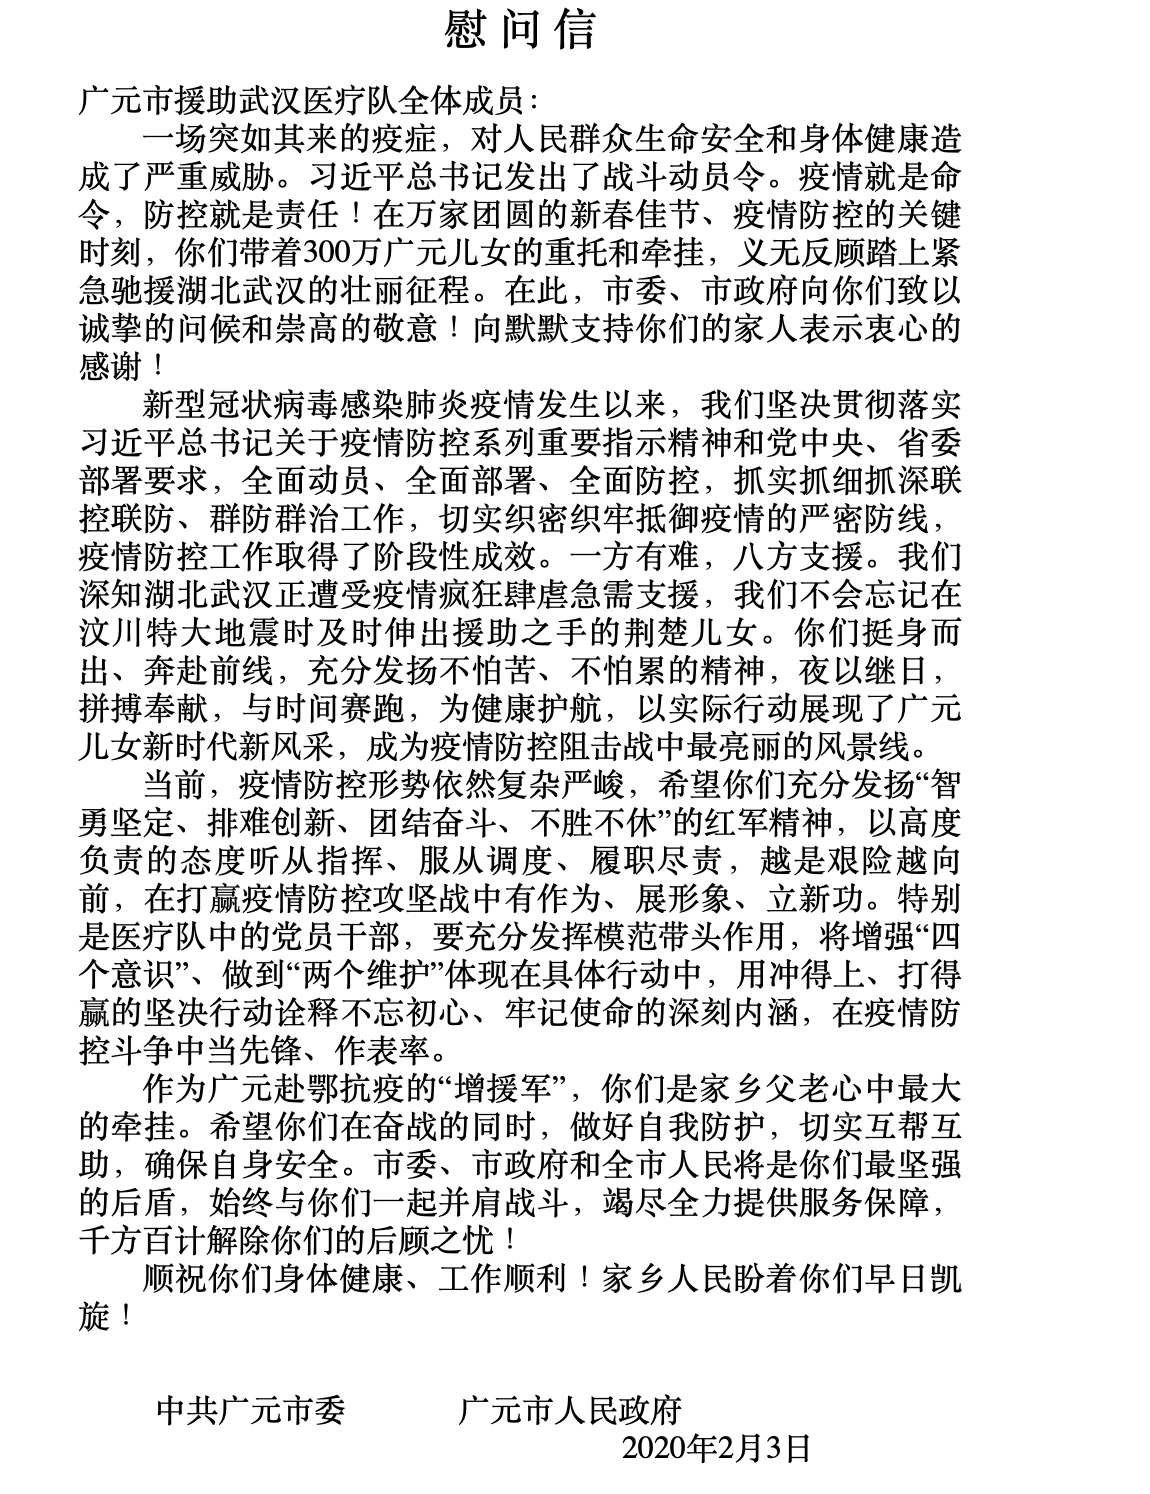 http://www.k2summit.cn/jiankangzhinan/1952648.html